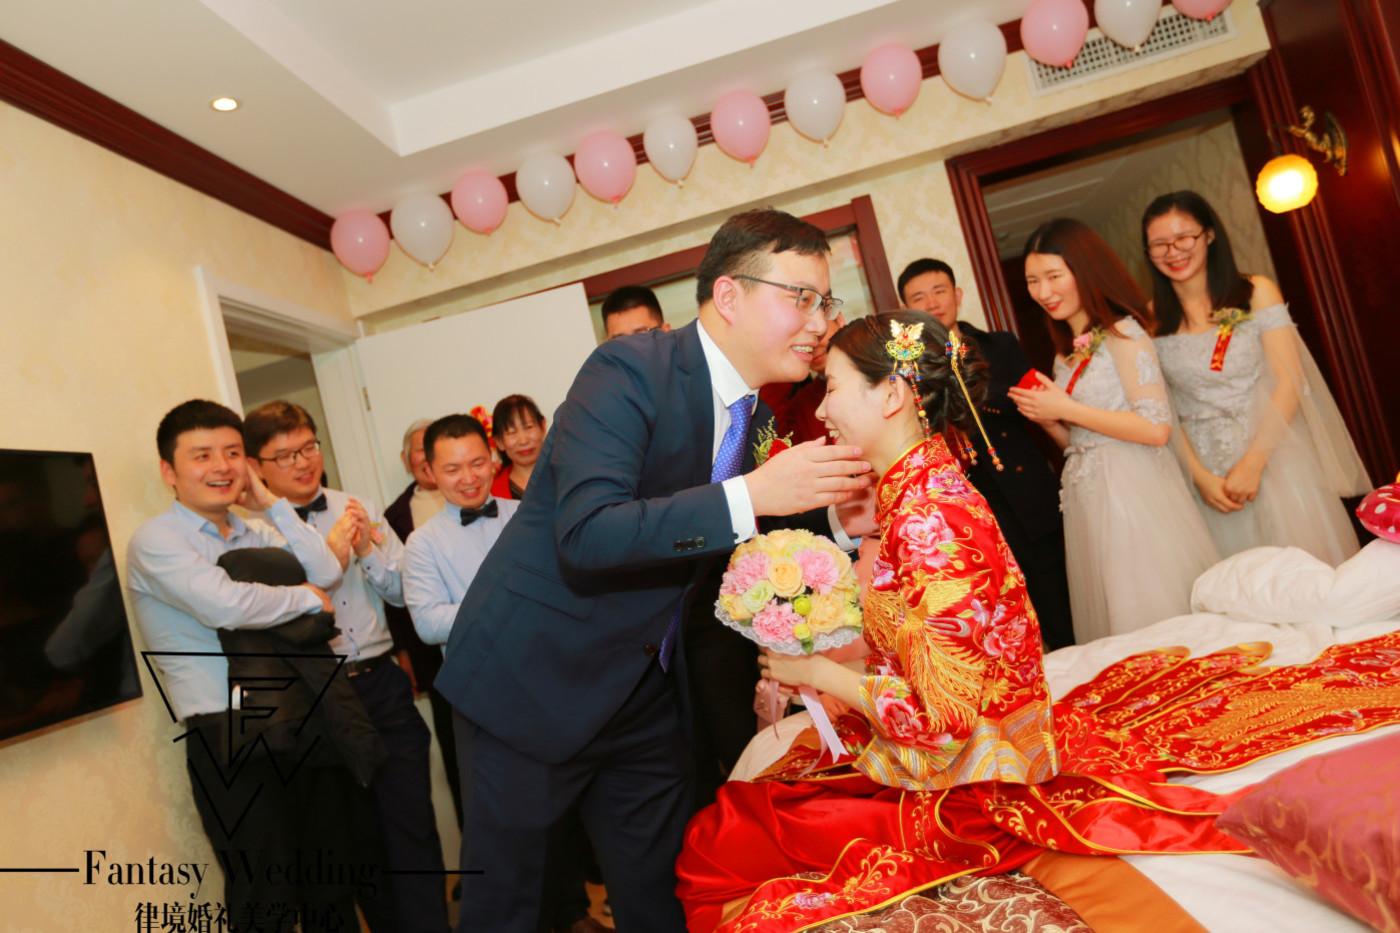 「Fantasy Wedding」& A/P 南艳湖13